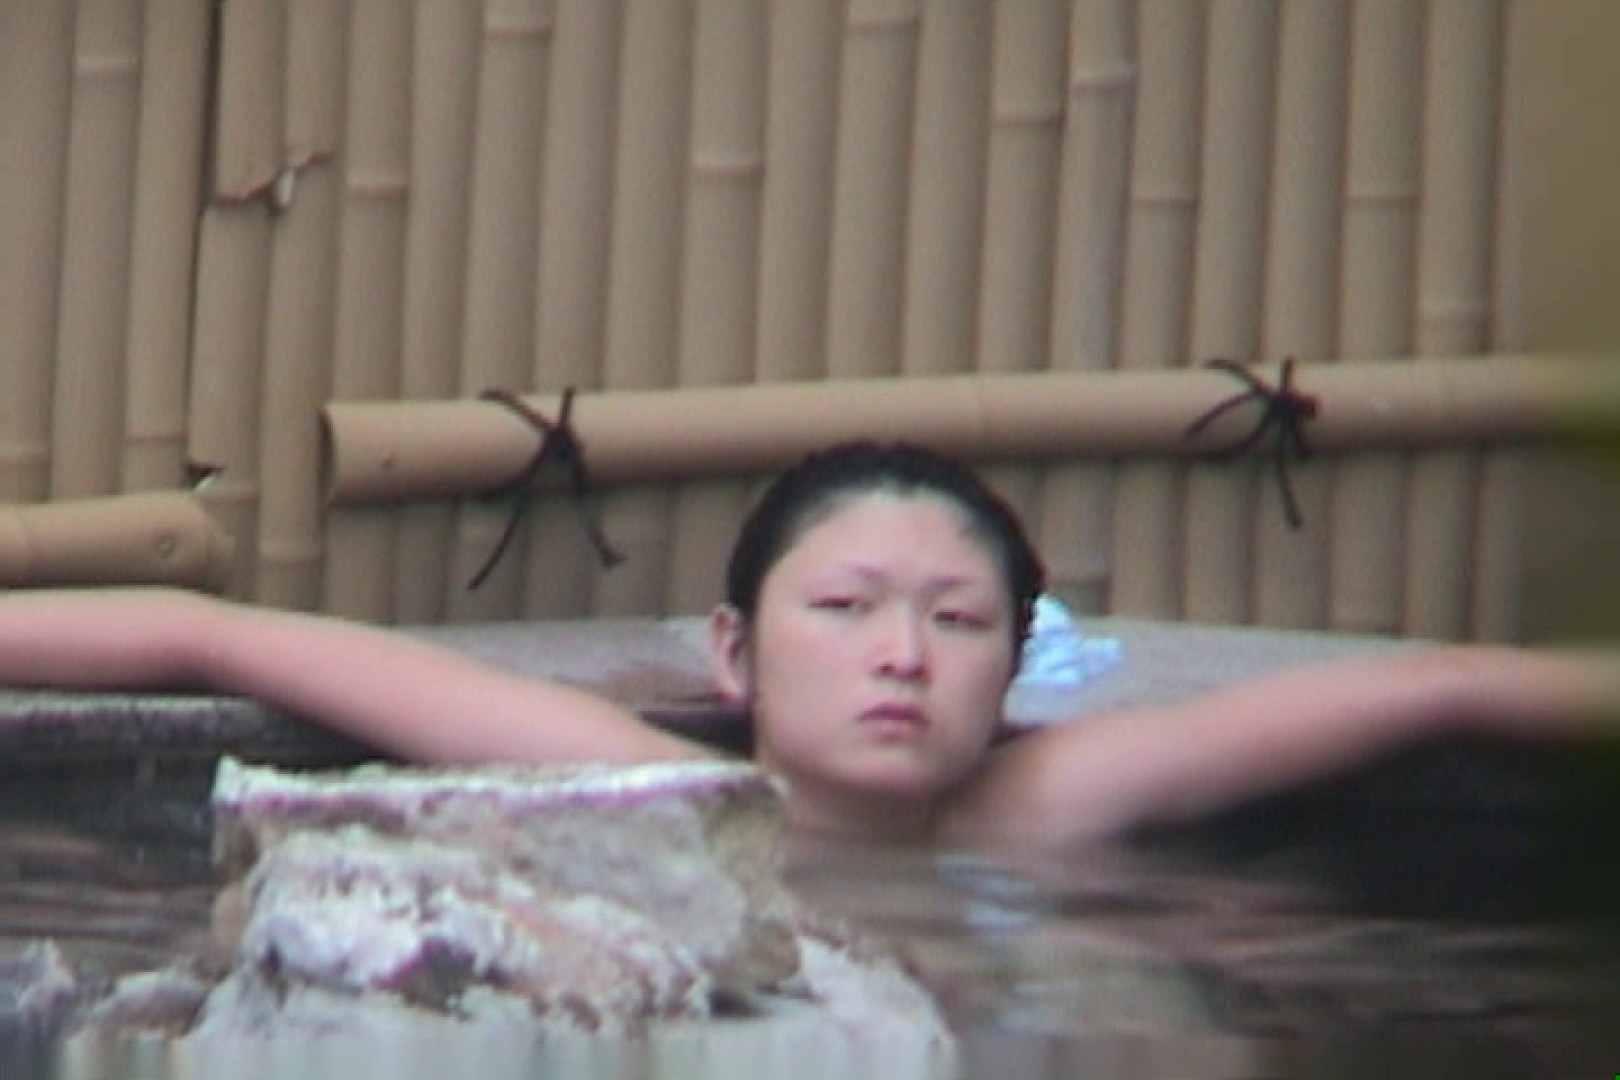 Aquaな露天風呂Vol.601 HなOL 戯れ無修正画像 99pic 32